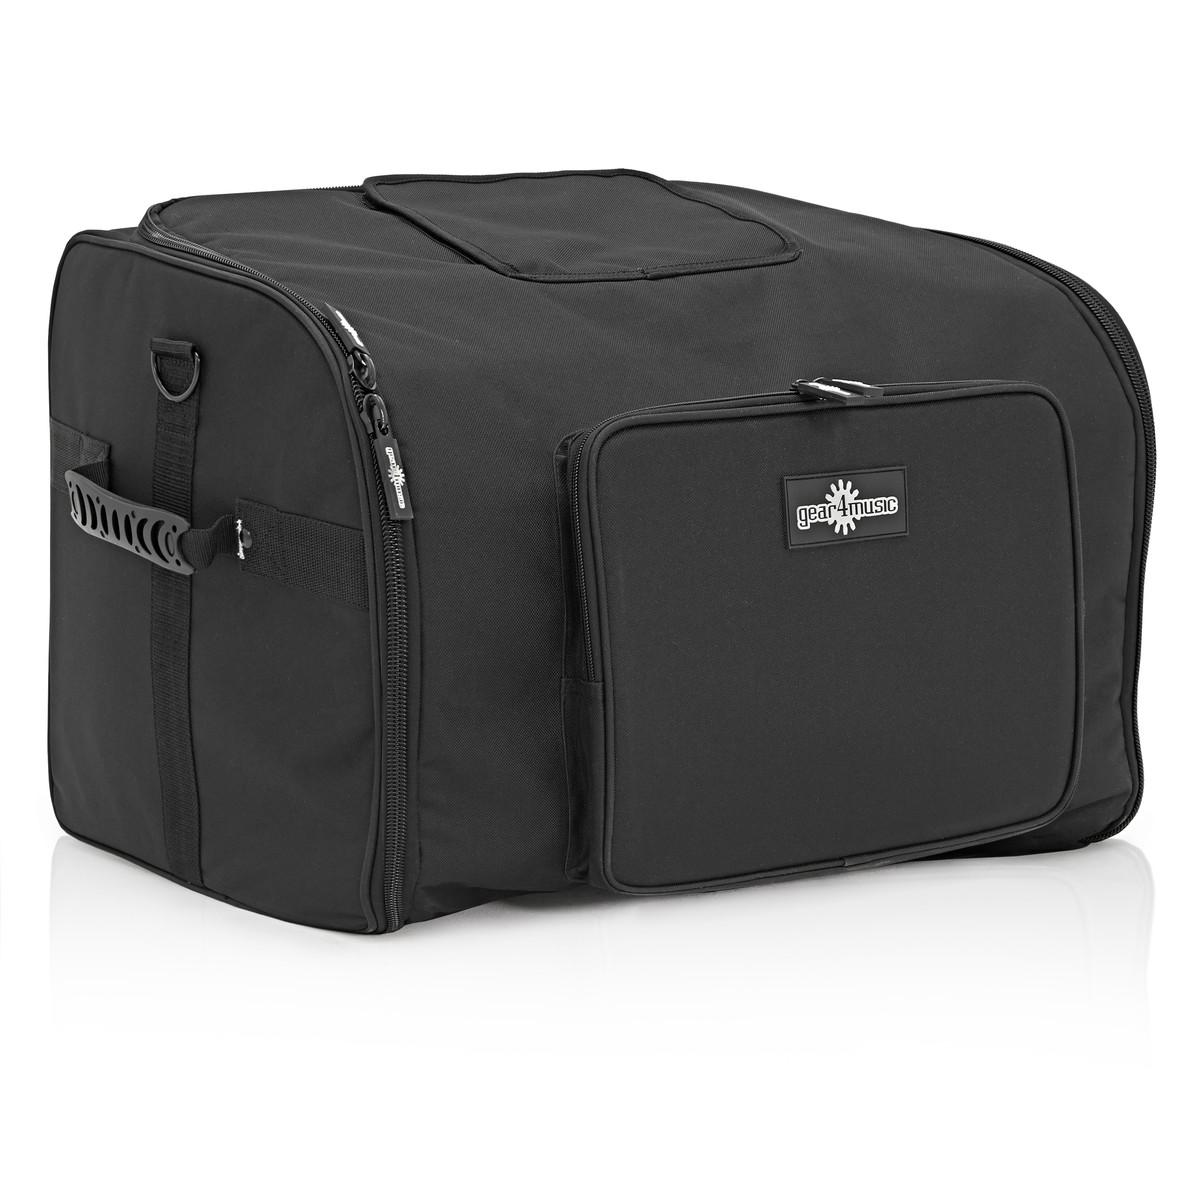 12 Inch PA Speaker Bag by Gear4music - B-Stock